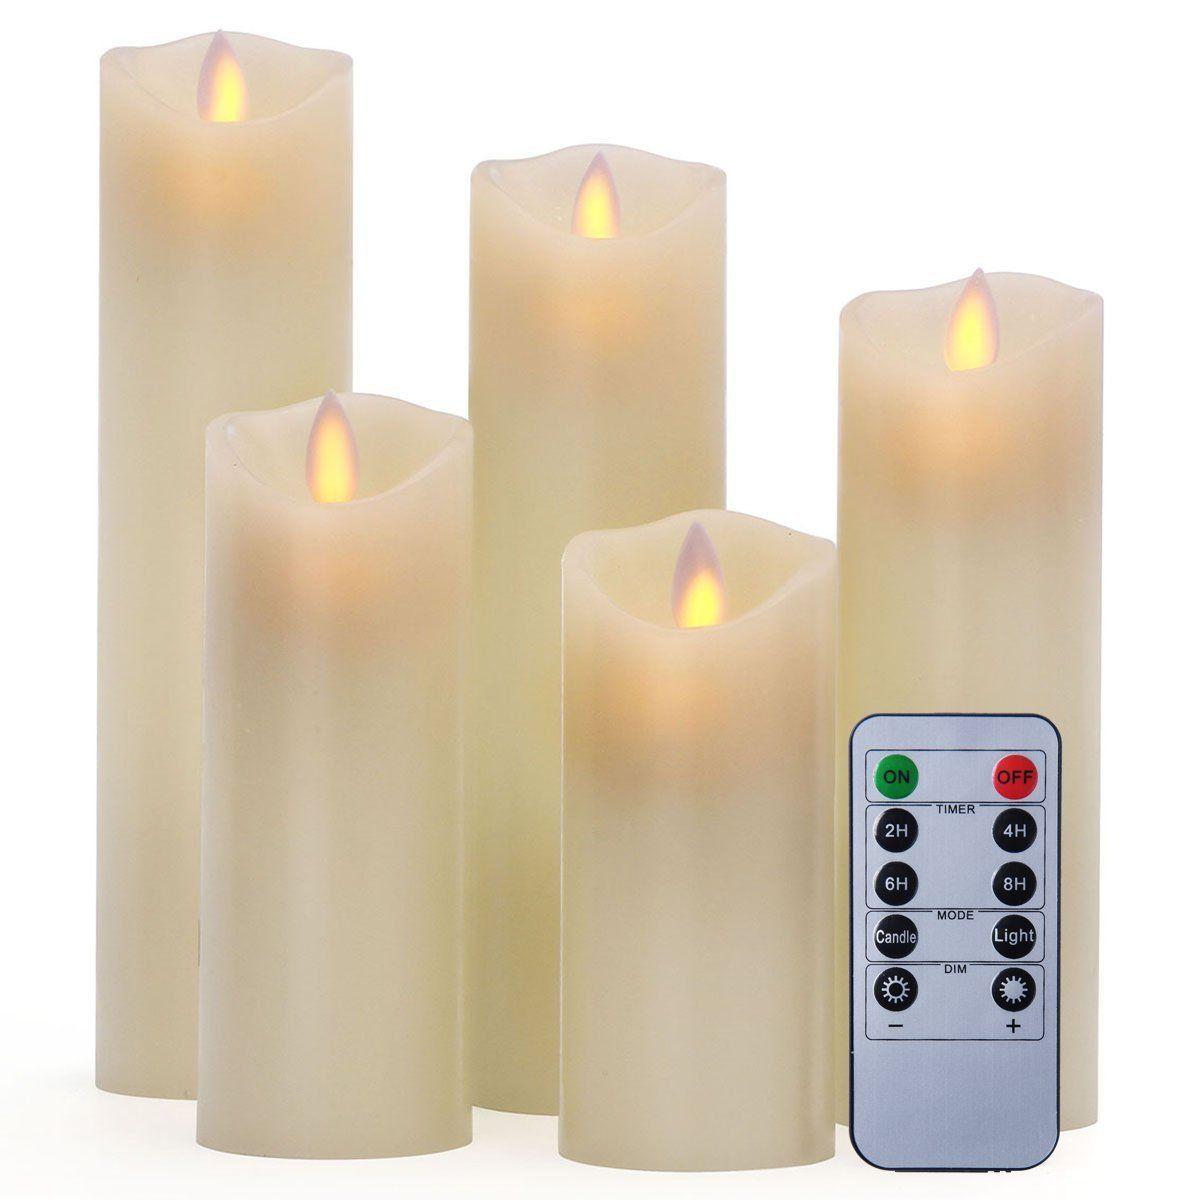 Pandaing u u u u u set of flameless candles with key